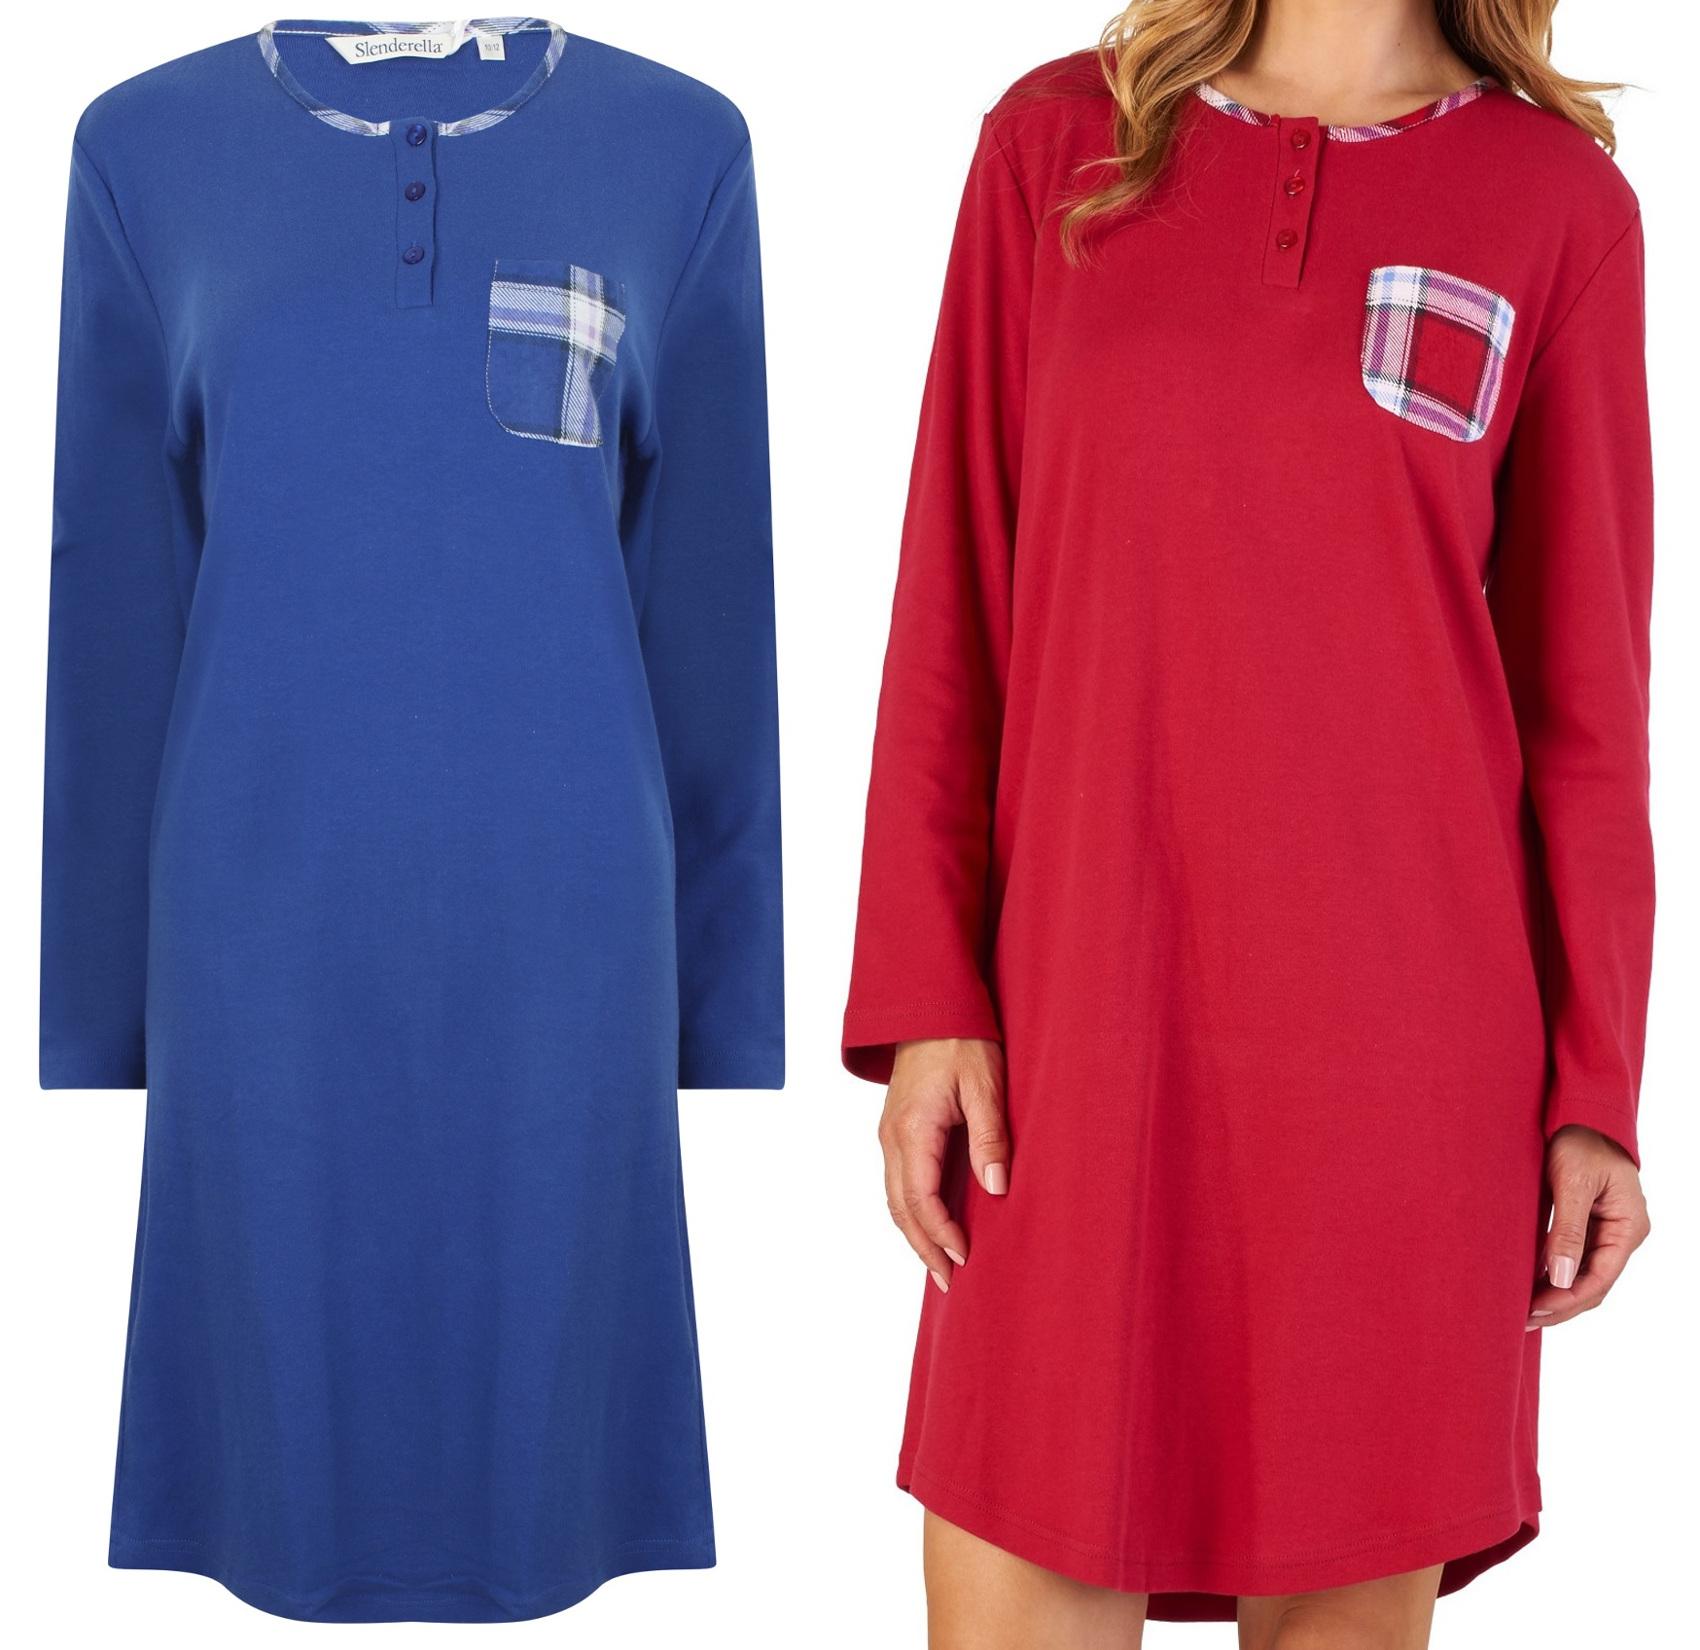 Nightdress Womens Slenderella Soft Jersey Cotton Tartan Trim Nightwear  Nighty eea12d8bf